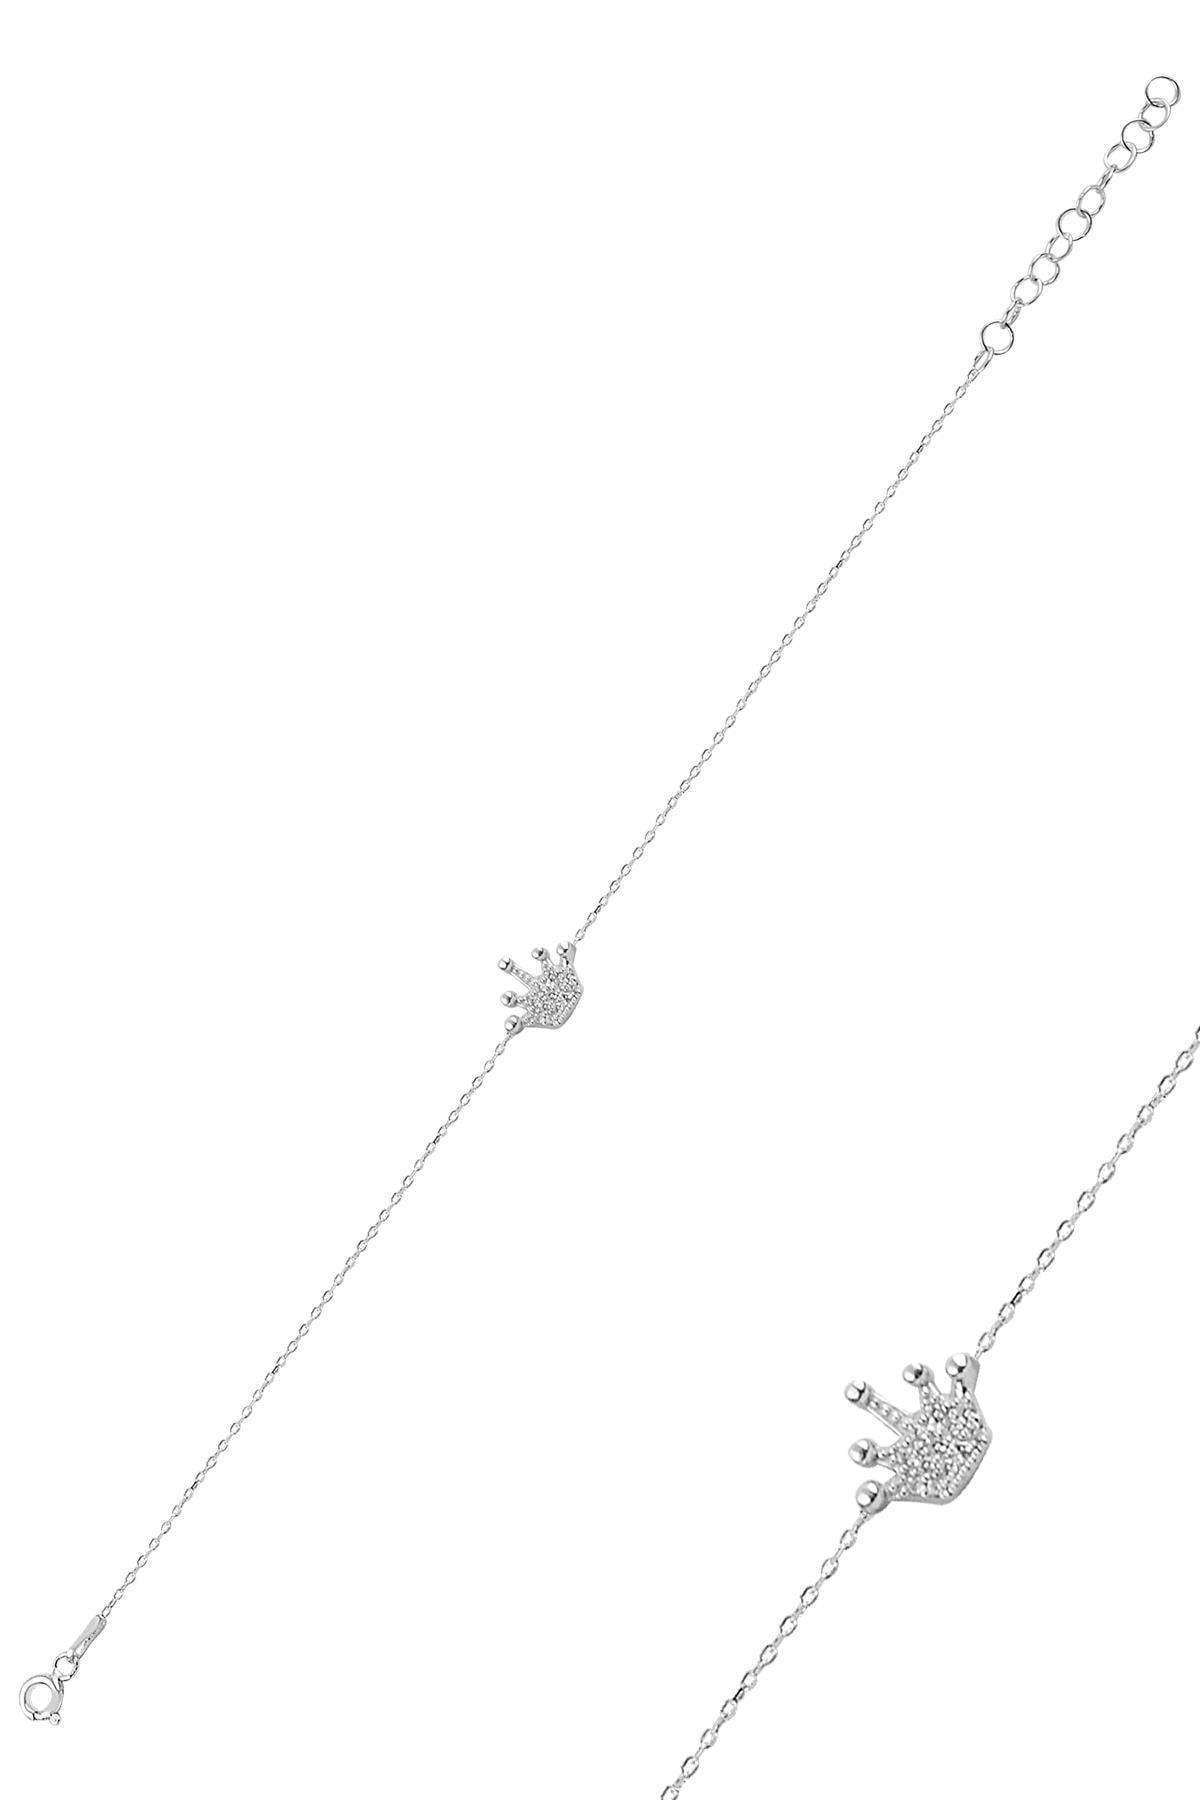 Söğütlü Silver Gümüş Taç Bileklik